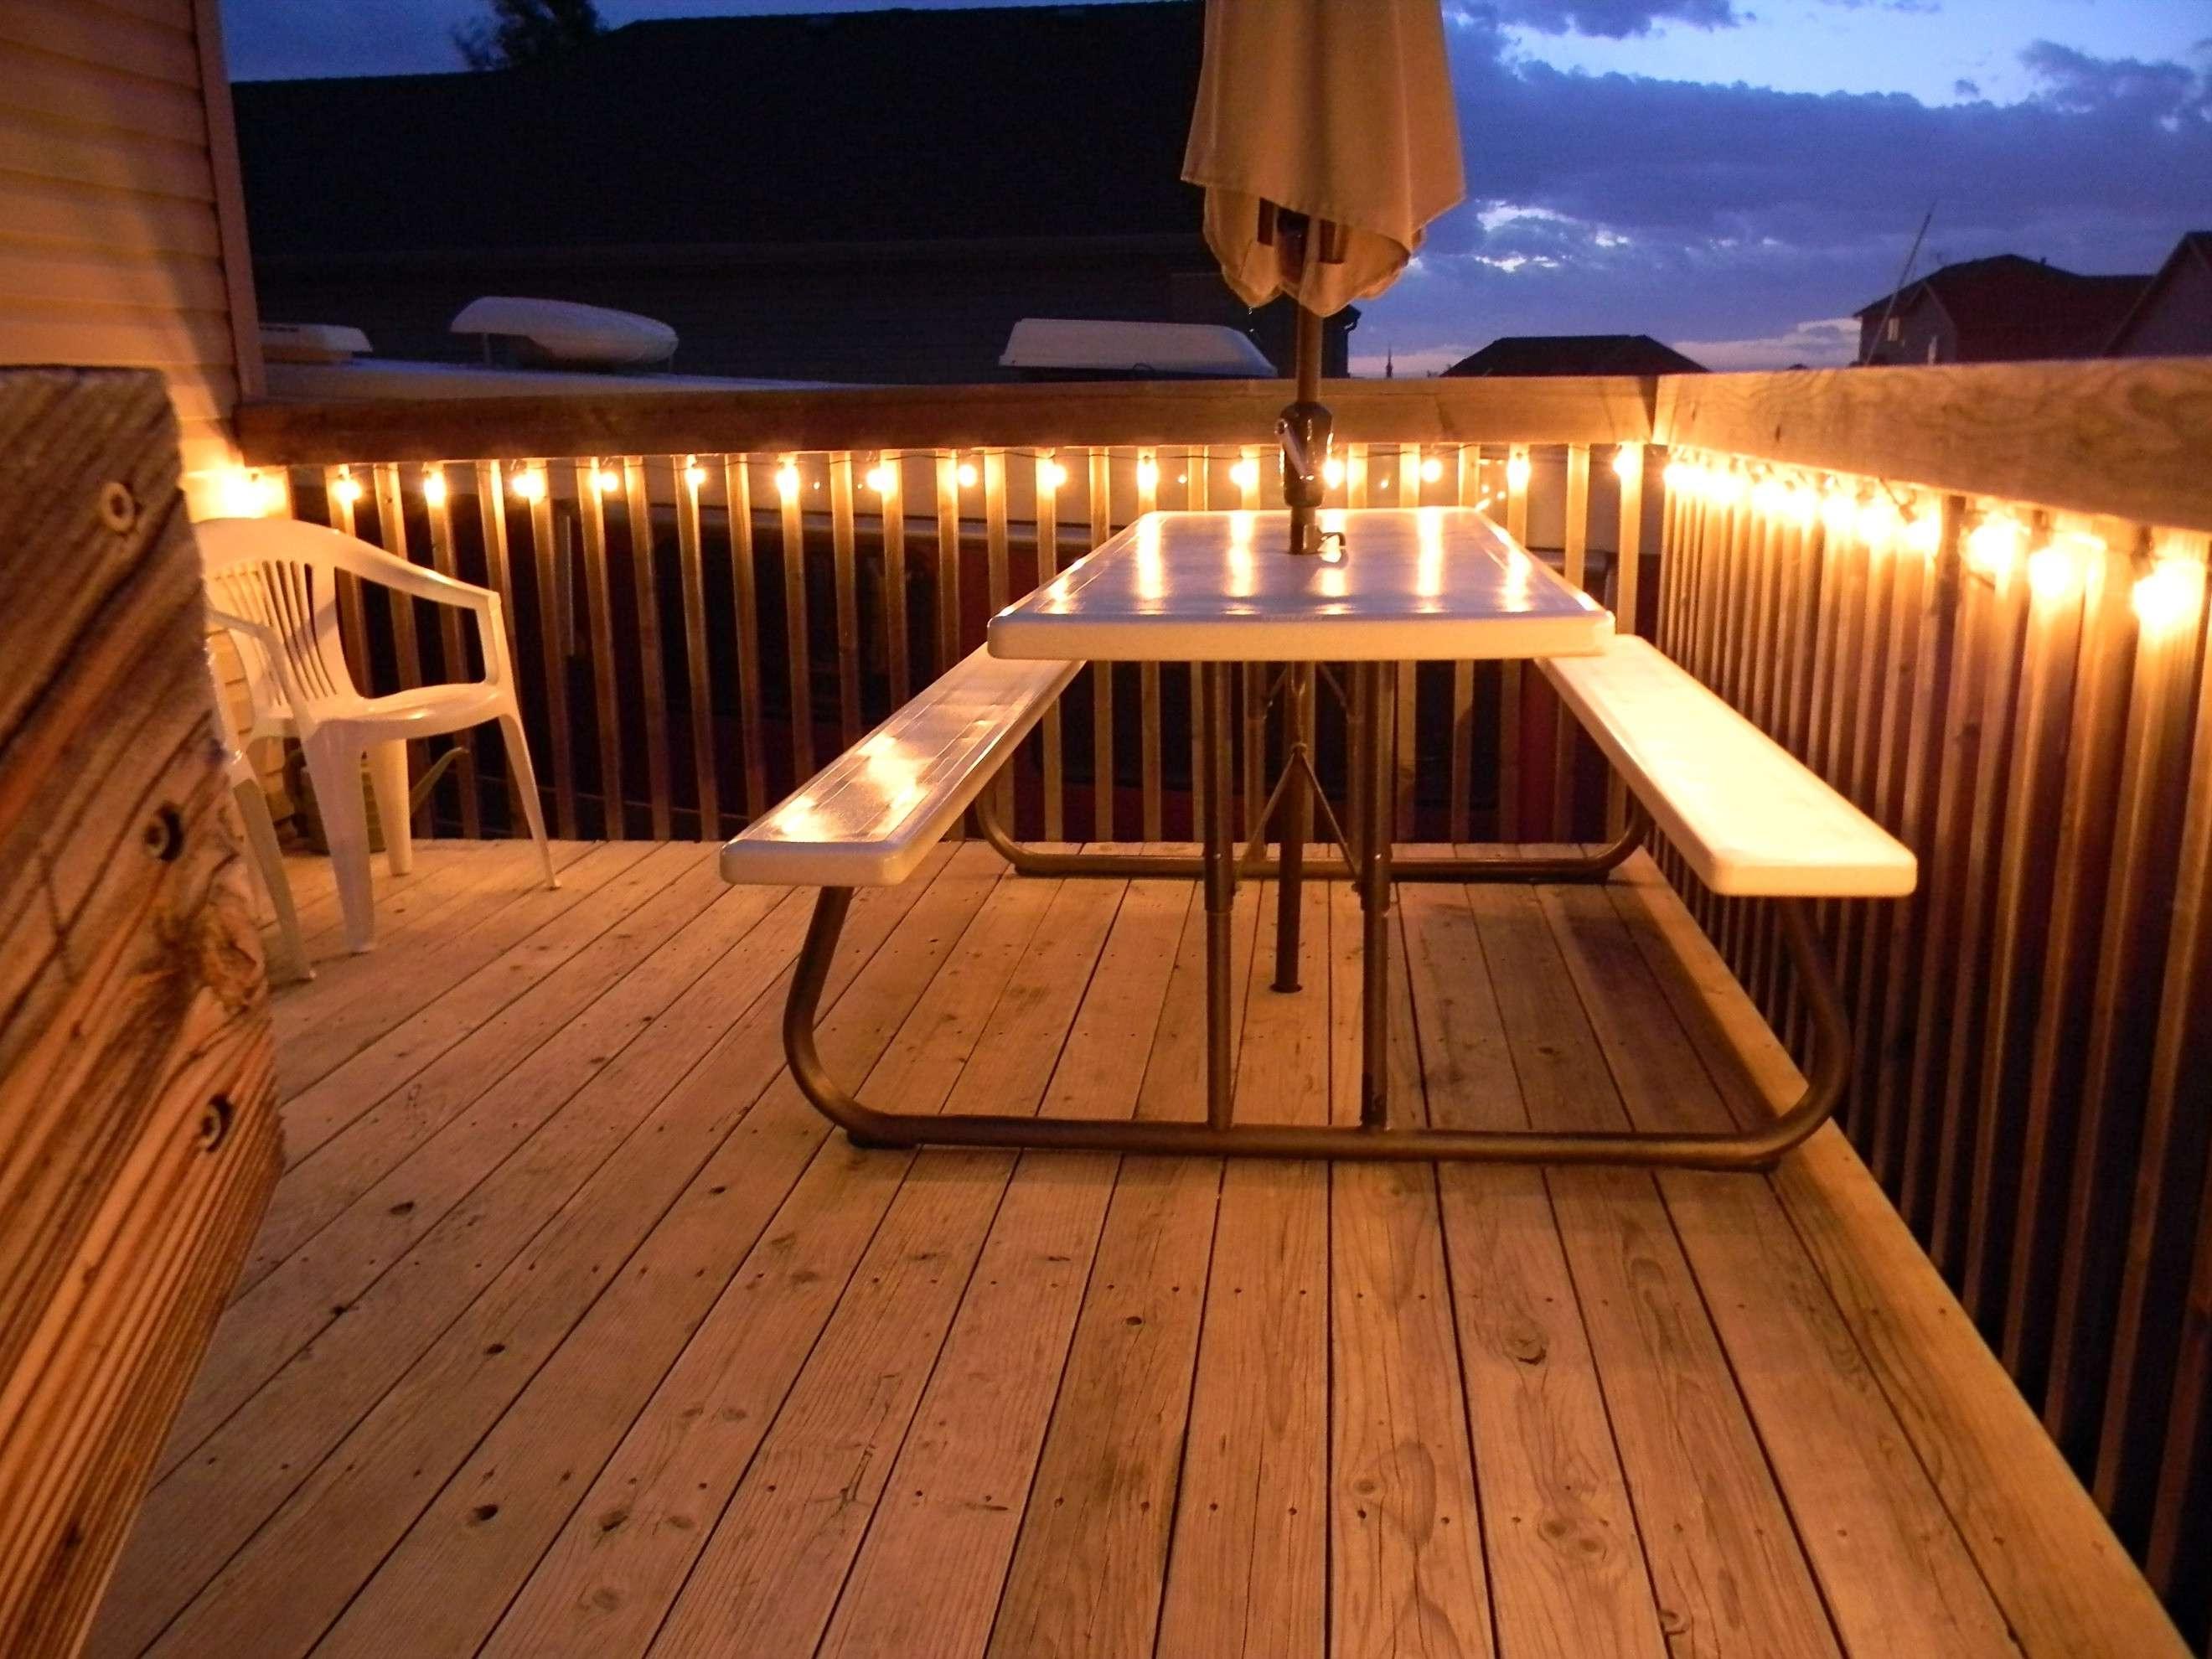 Solar Deck Lighting Kits Wonderful 39 Best Outdoor Deck Lighting With Widely Used Outdoor Deck Lanterns (View 2 of 20)